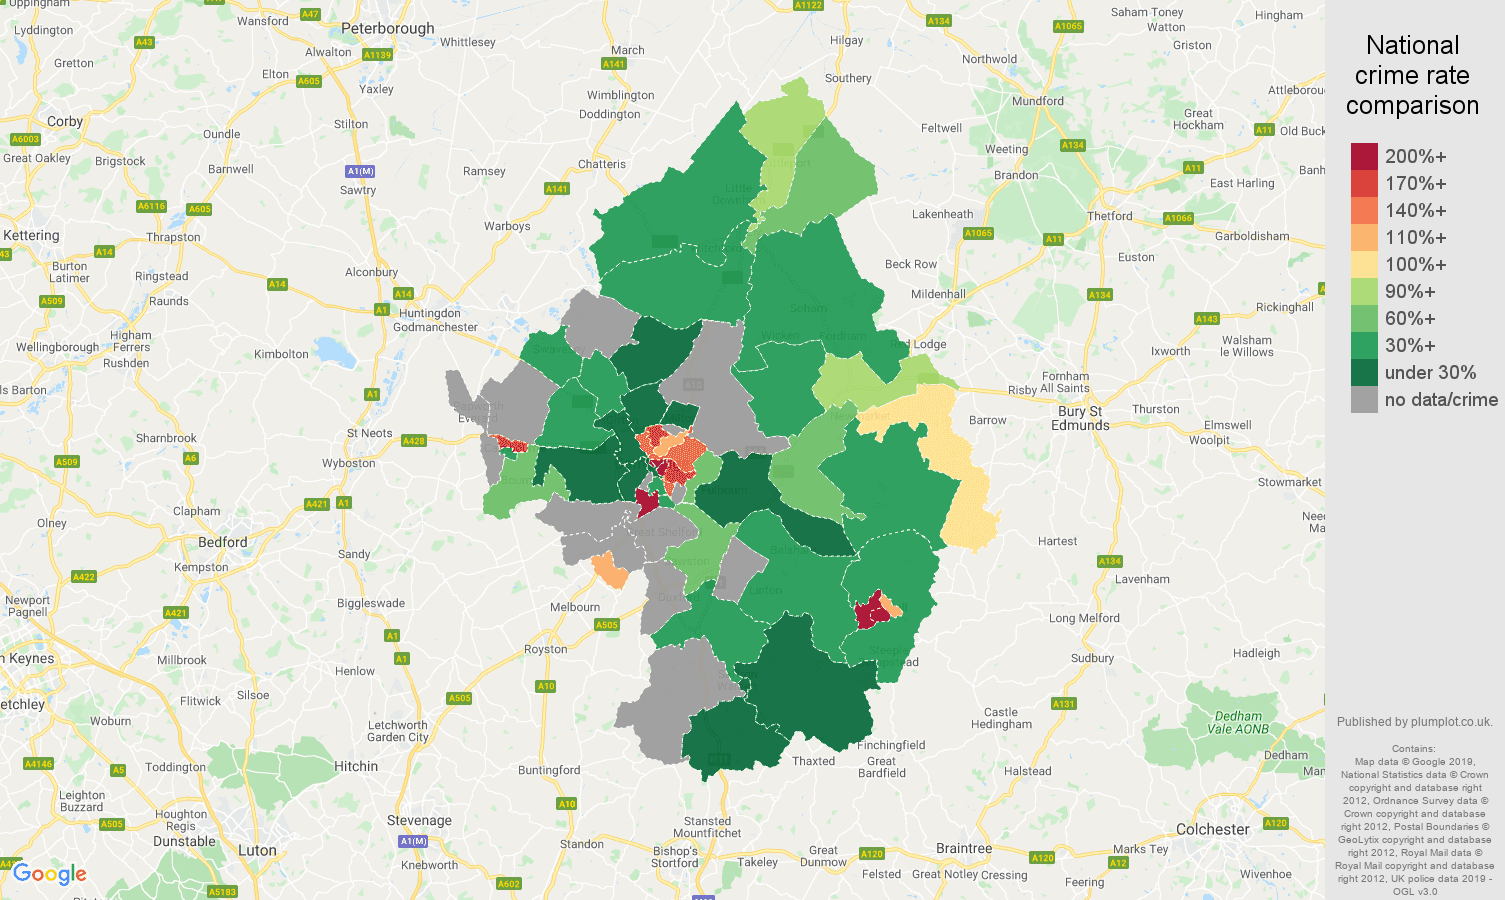 Cambridge possession of weapons crime rate comparison map